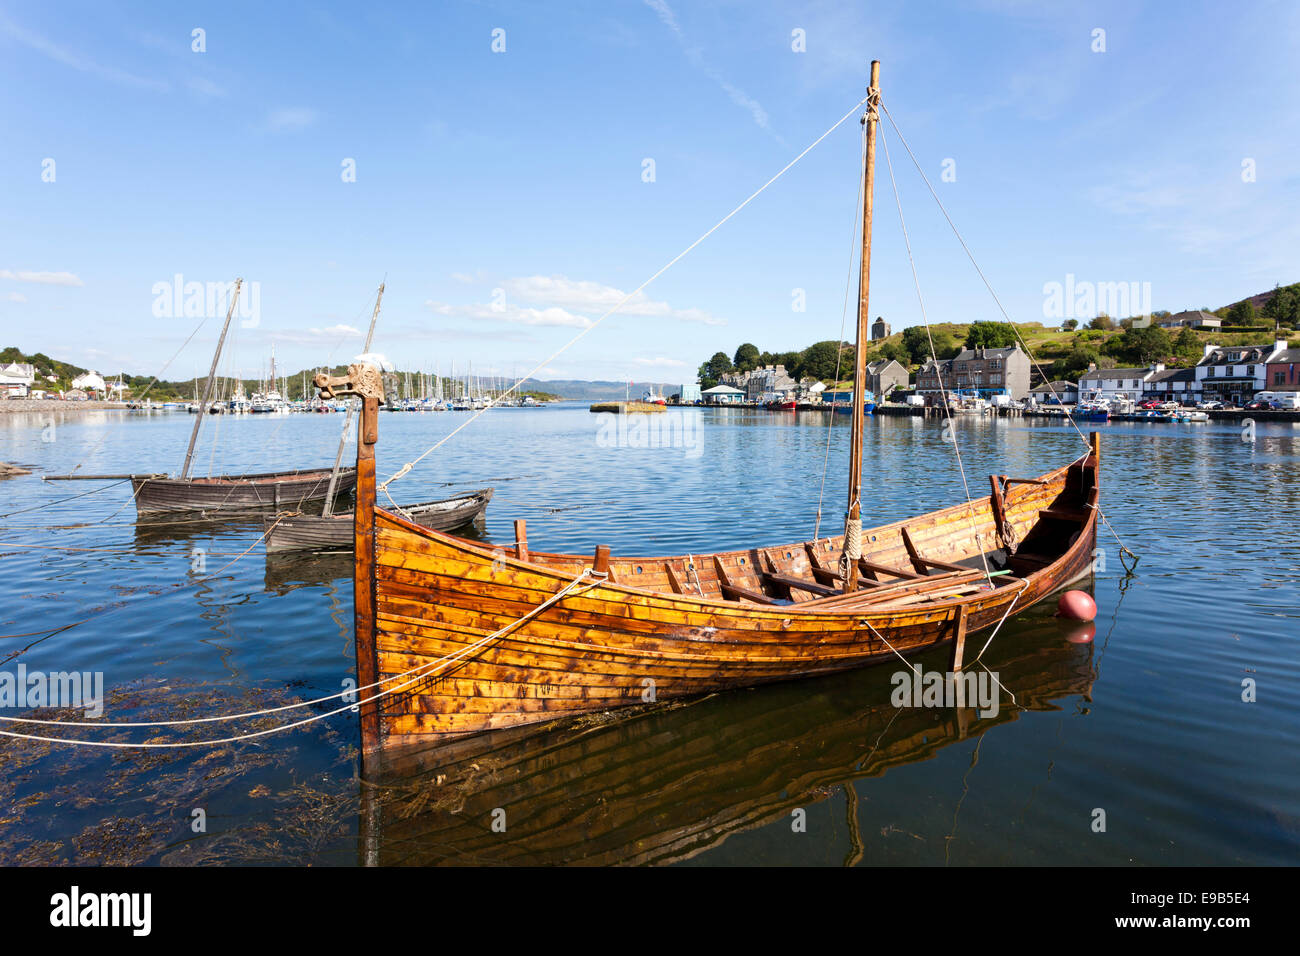 A Viking longboat, built locally for the first Loch Fyne Viking festival, Tarbert, Argyll & Bute, Scotland UK - Stock Image